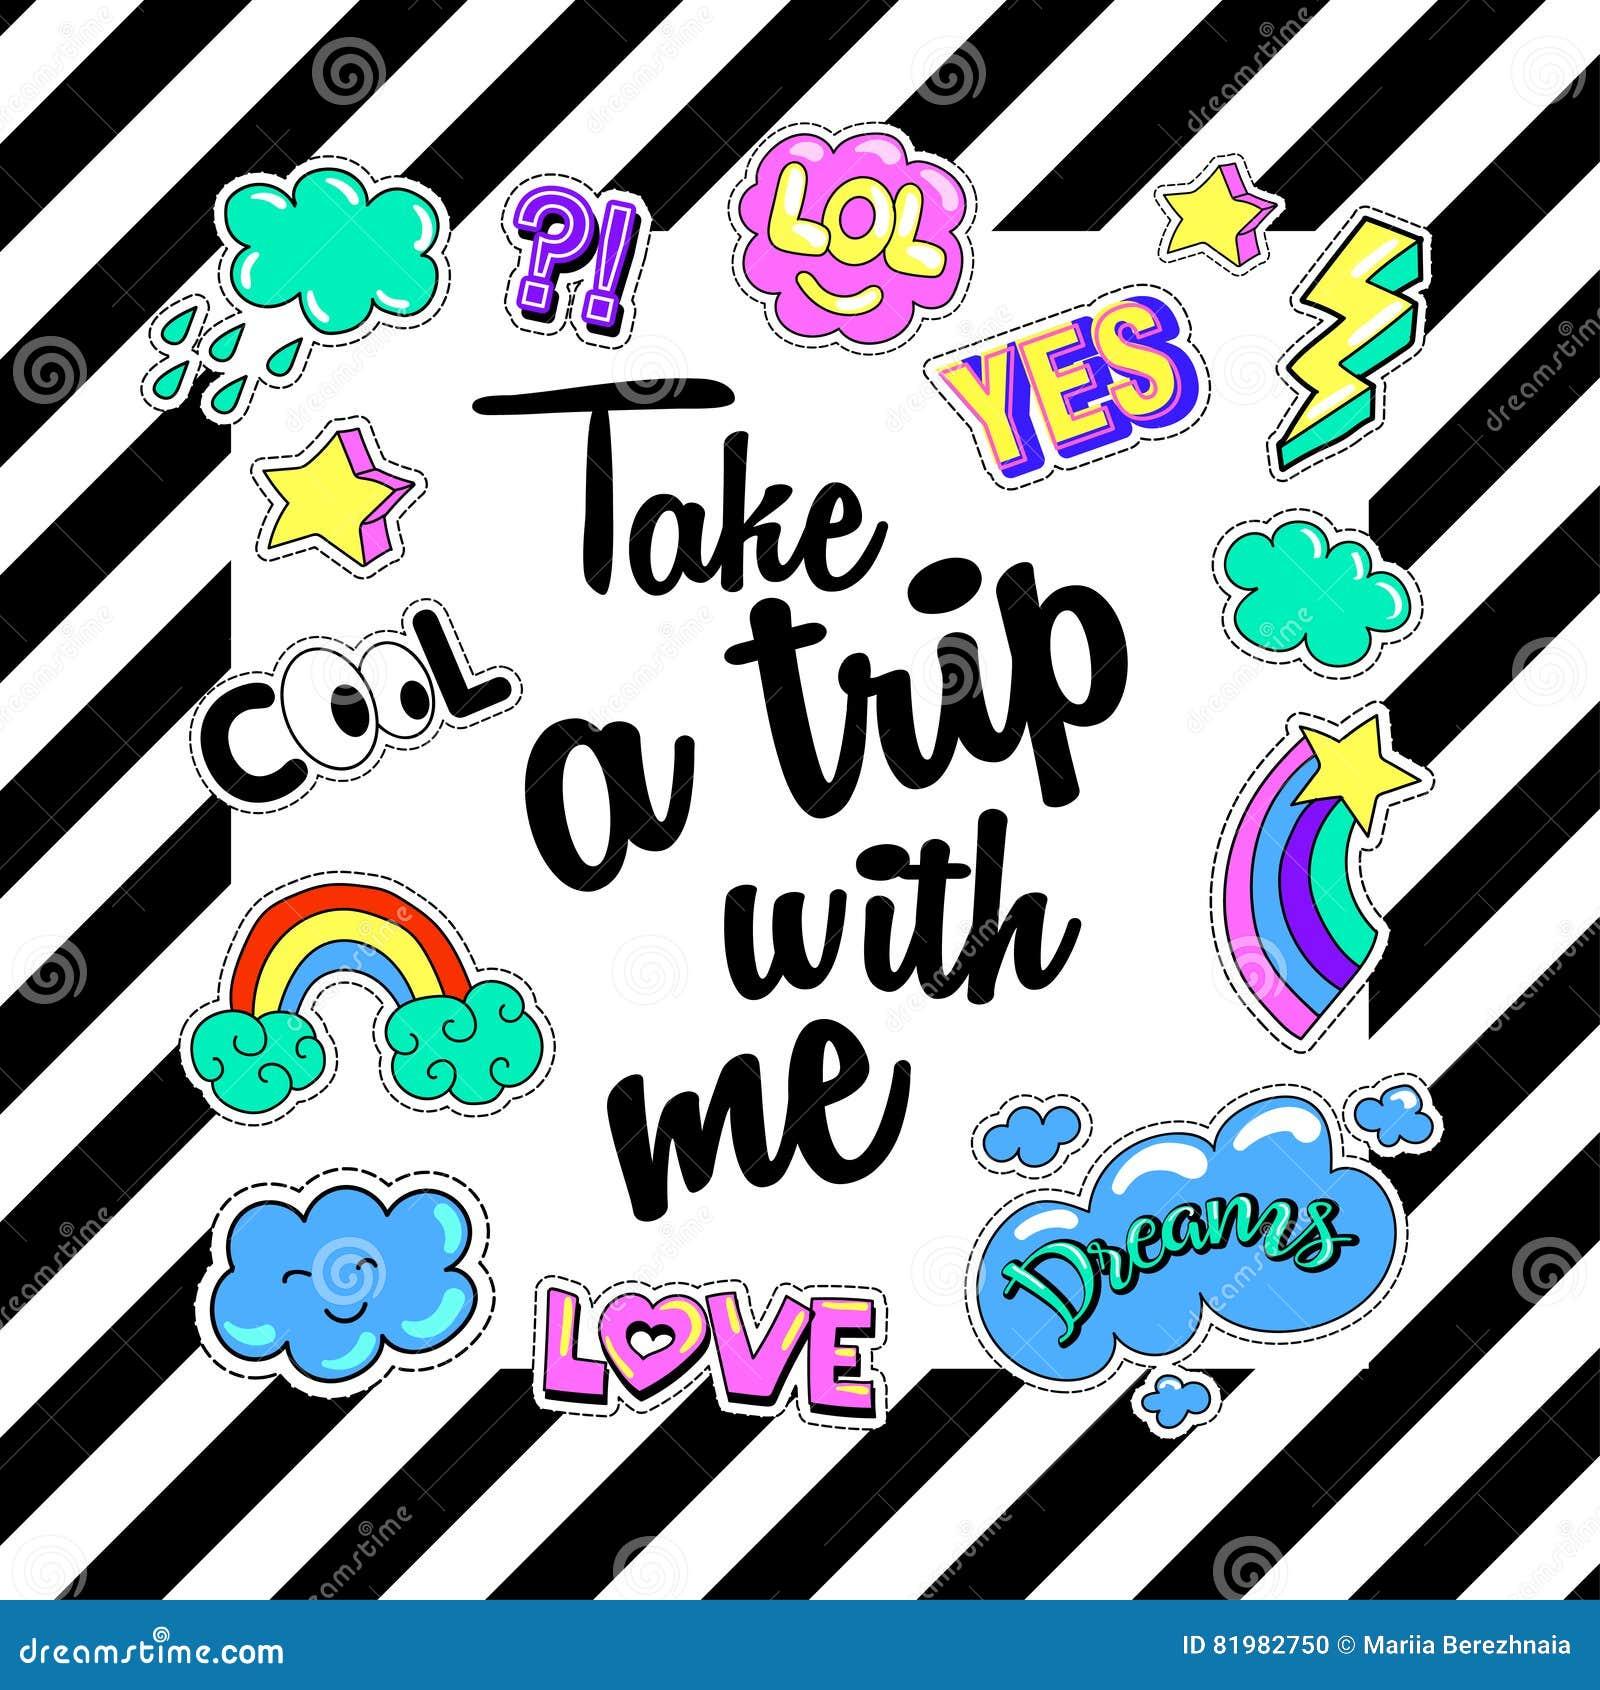 90s poster design - Take A Trip With Me Poster Banner Patch Badges Vector Illustration Design